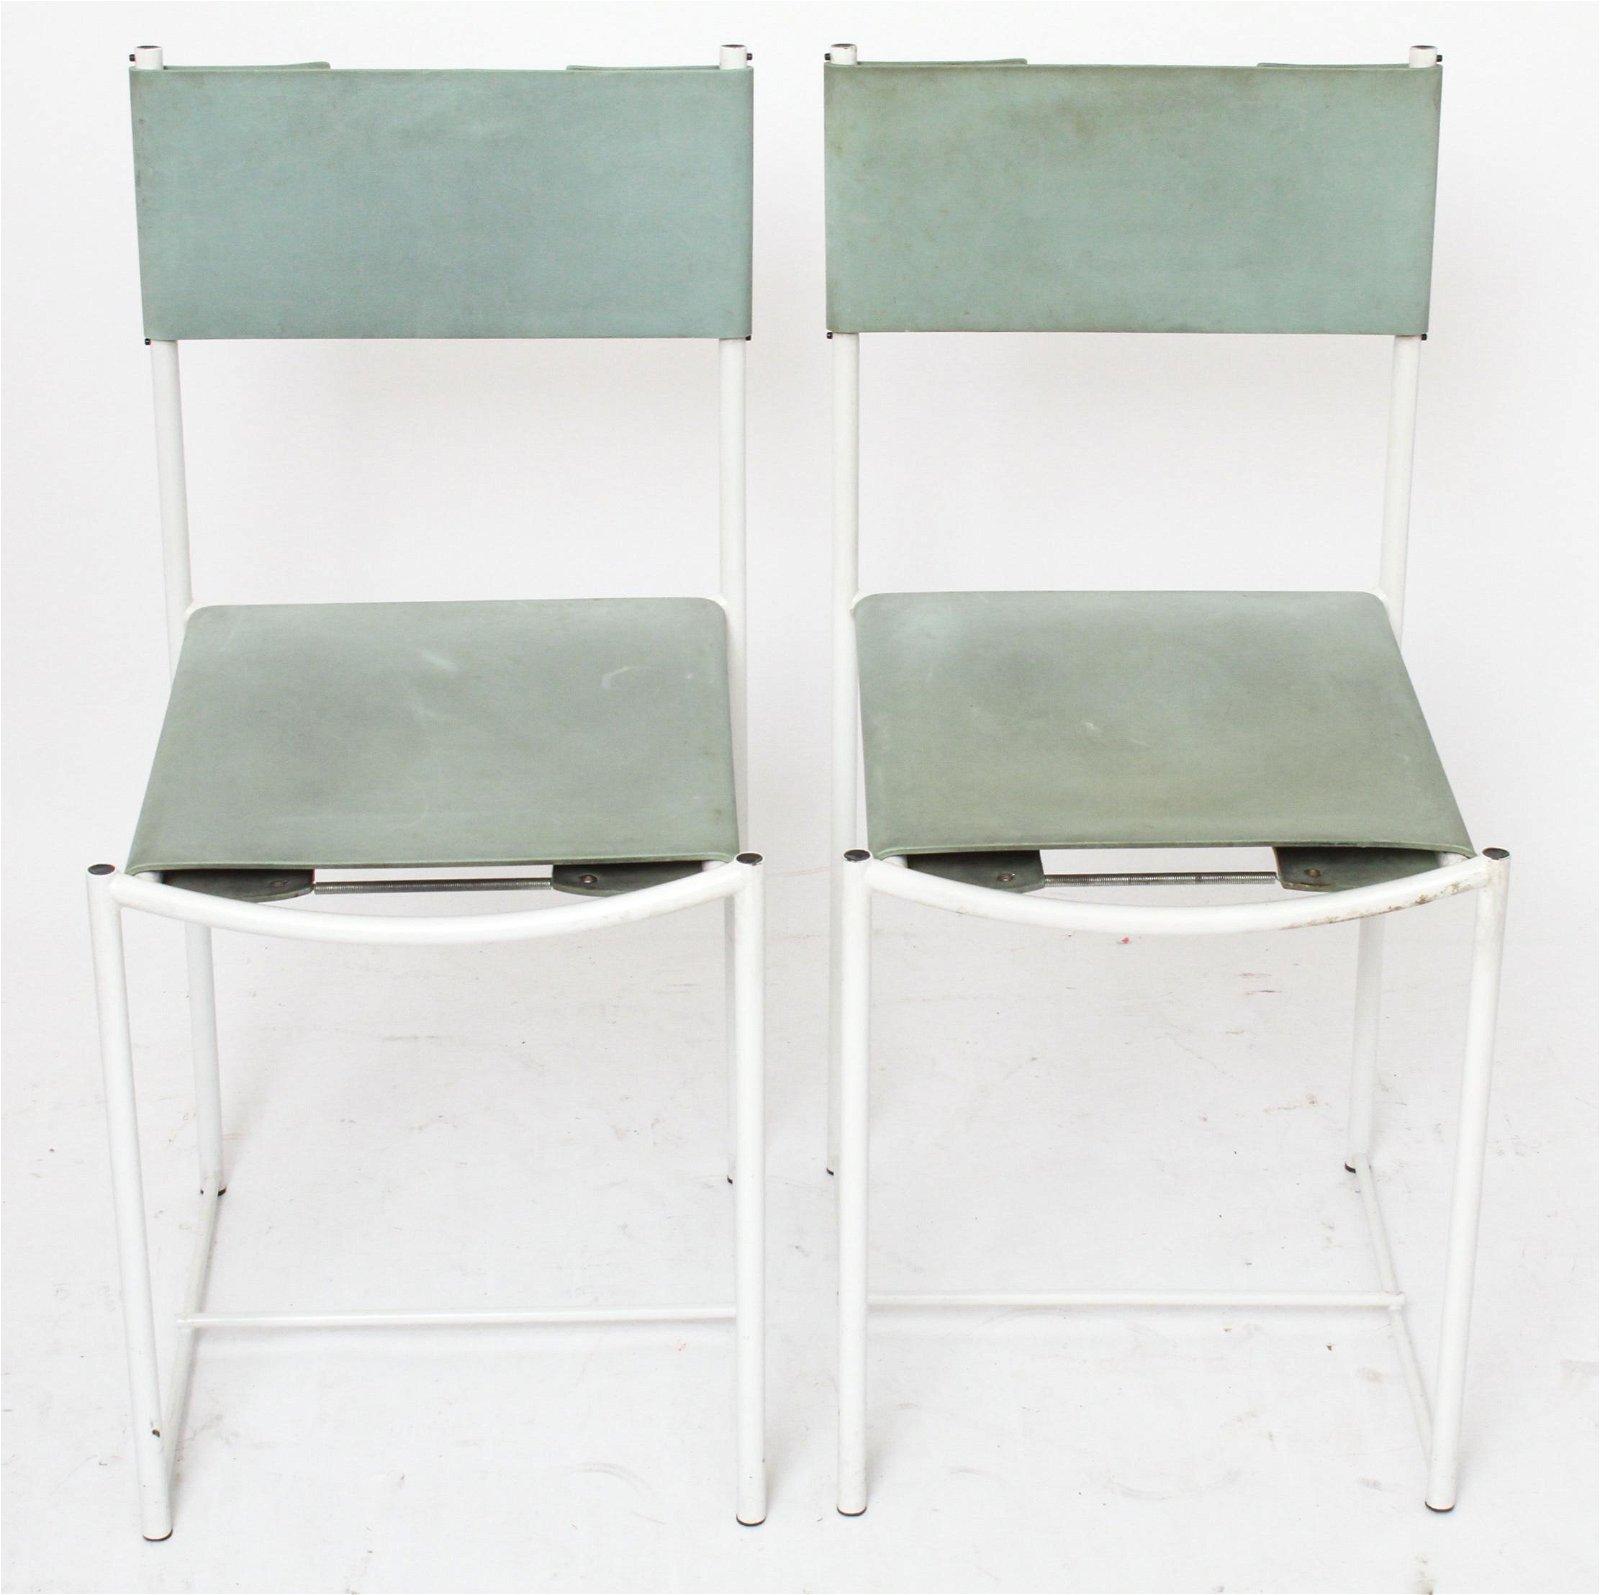 Modern Metal & Foam-Rubber Side Chairs, Pair